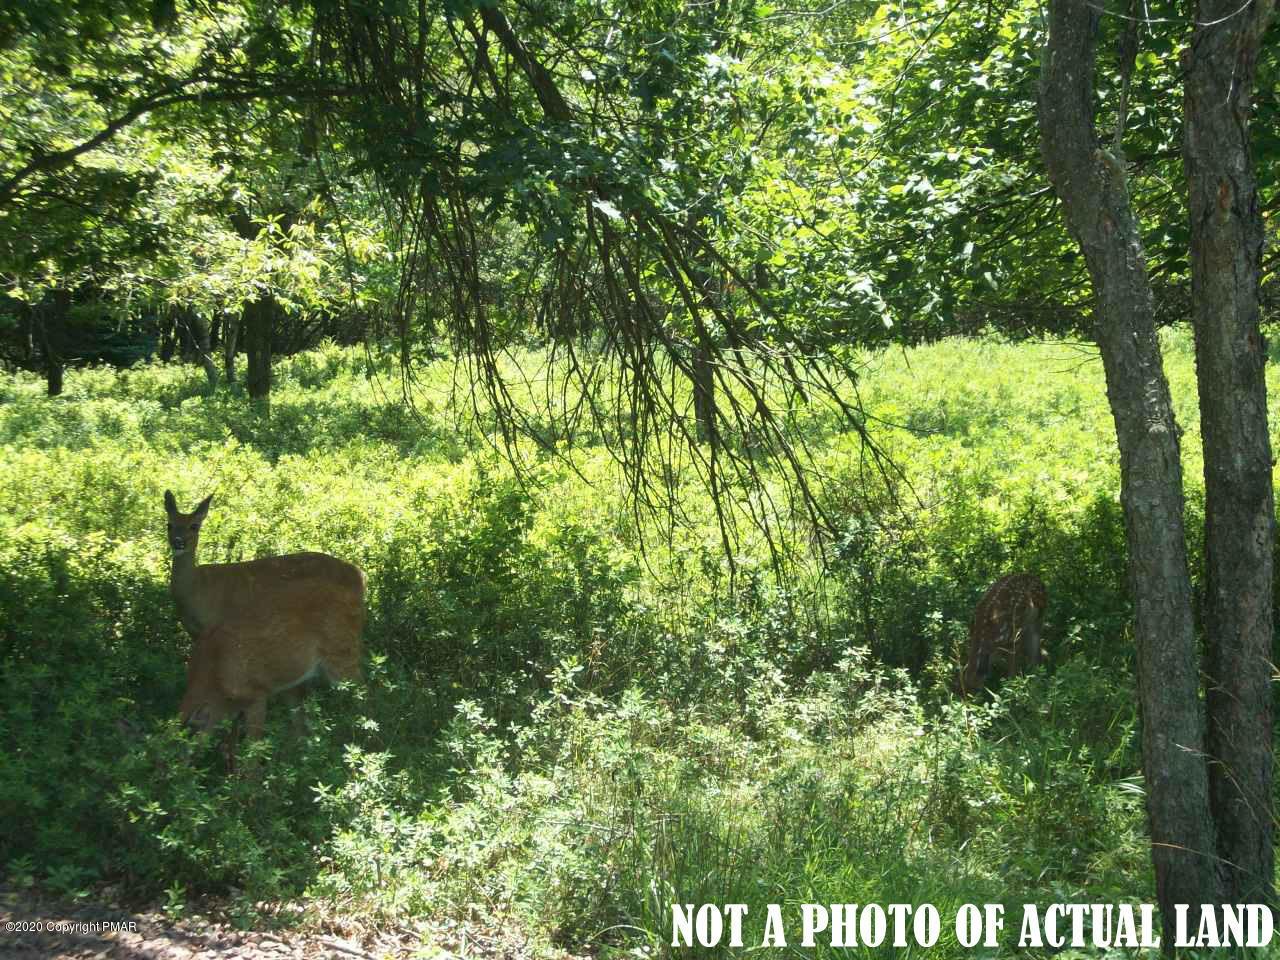 CP1030 Running Bear Lane, Albrightsville, PA, 18210 United States